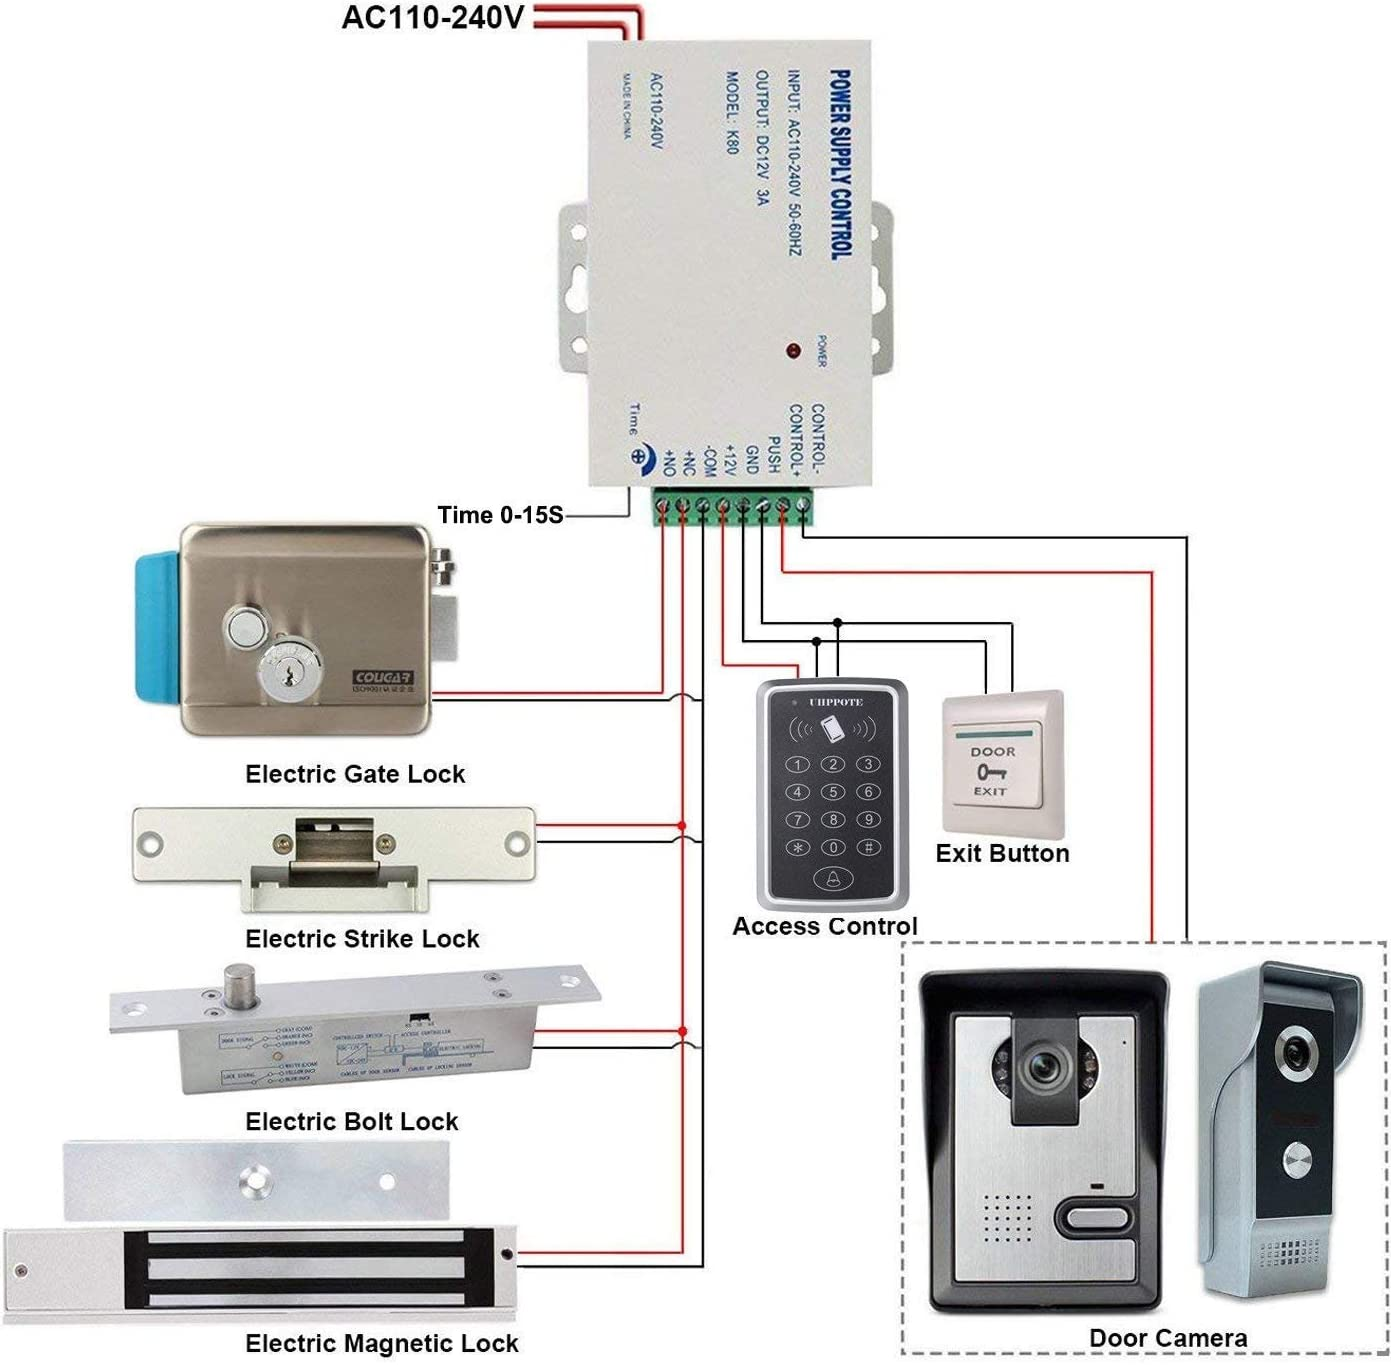 Amazon.com: UHPPOTE Power Supply 110-240VAC to 12VDC for Door Access  Control System & Intercom Camera: Home ImprovementAmazon.com